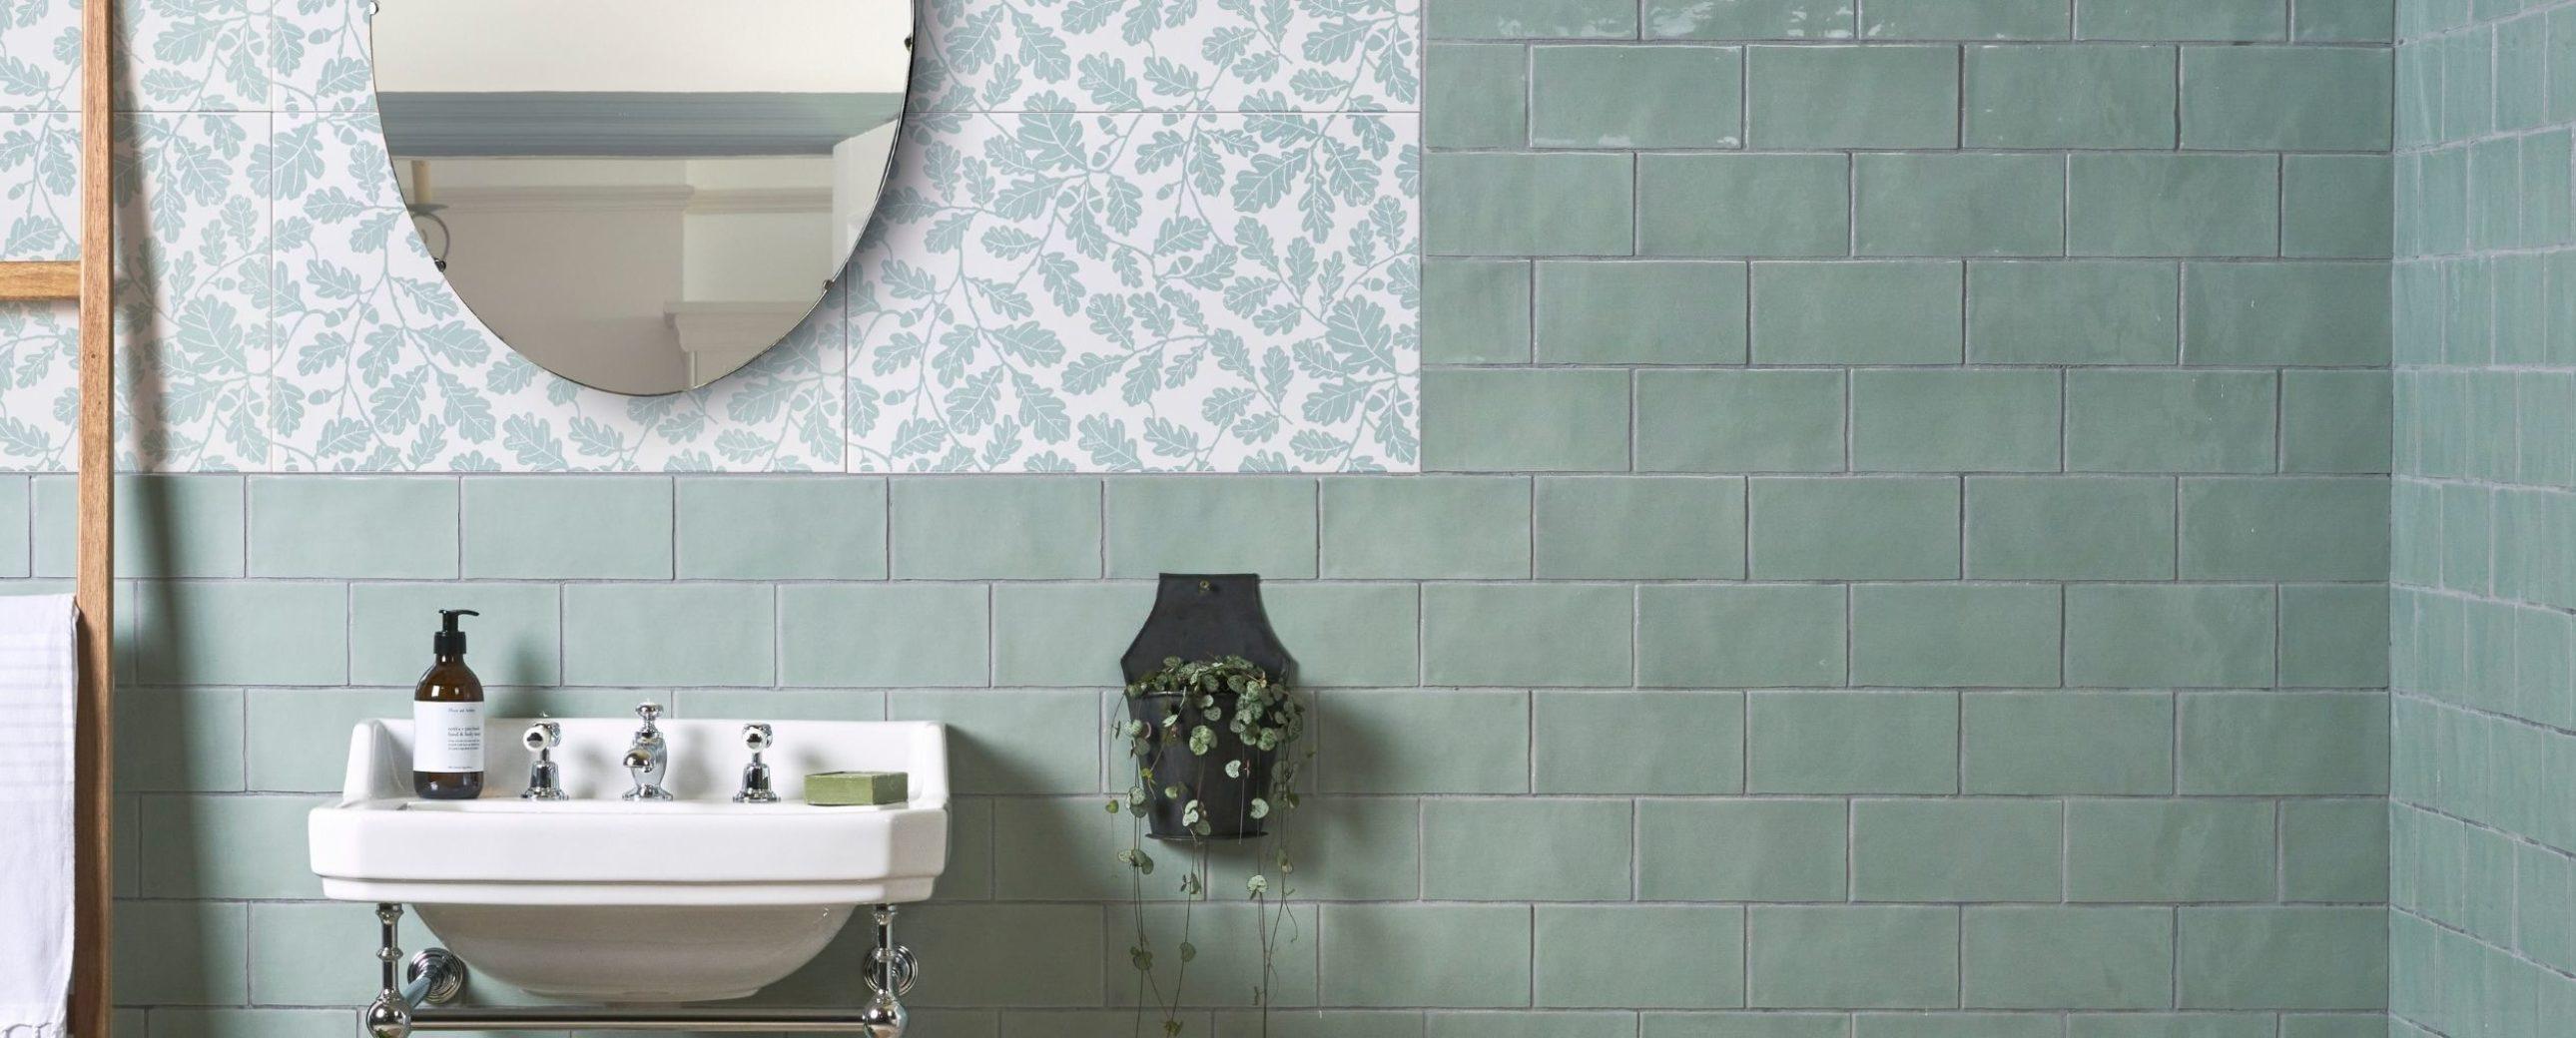 Laings introduces Ca' Pietra tiles